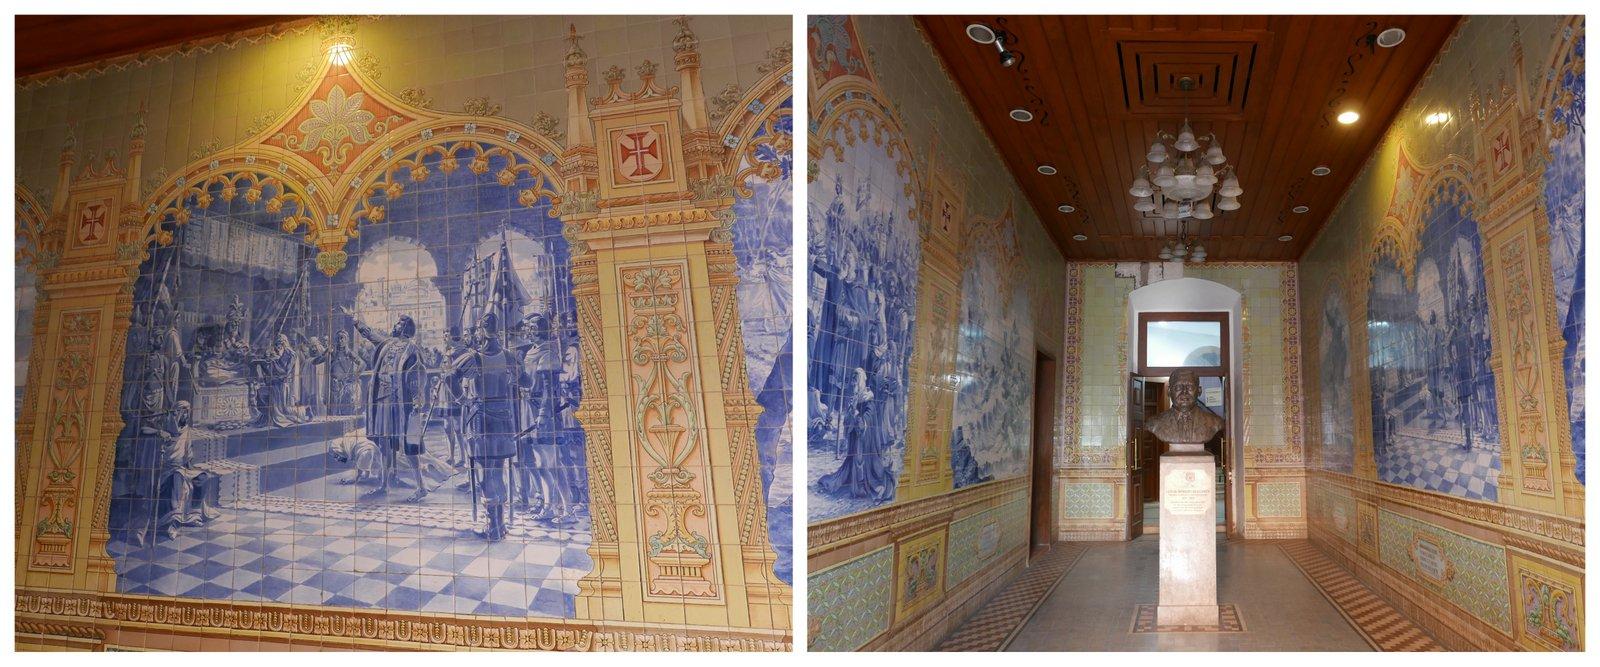 Les azulejos de l'Institut Menezes-Breganza à Paniji